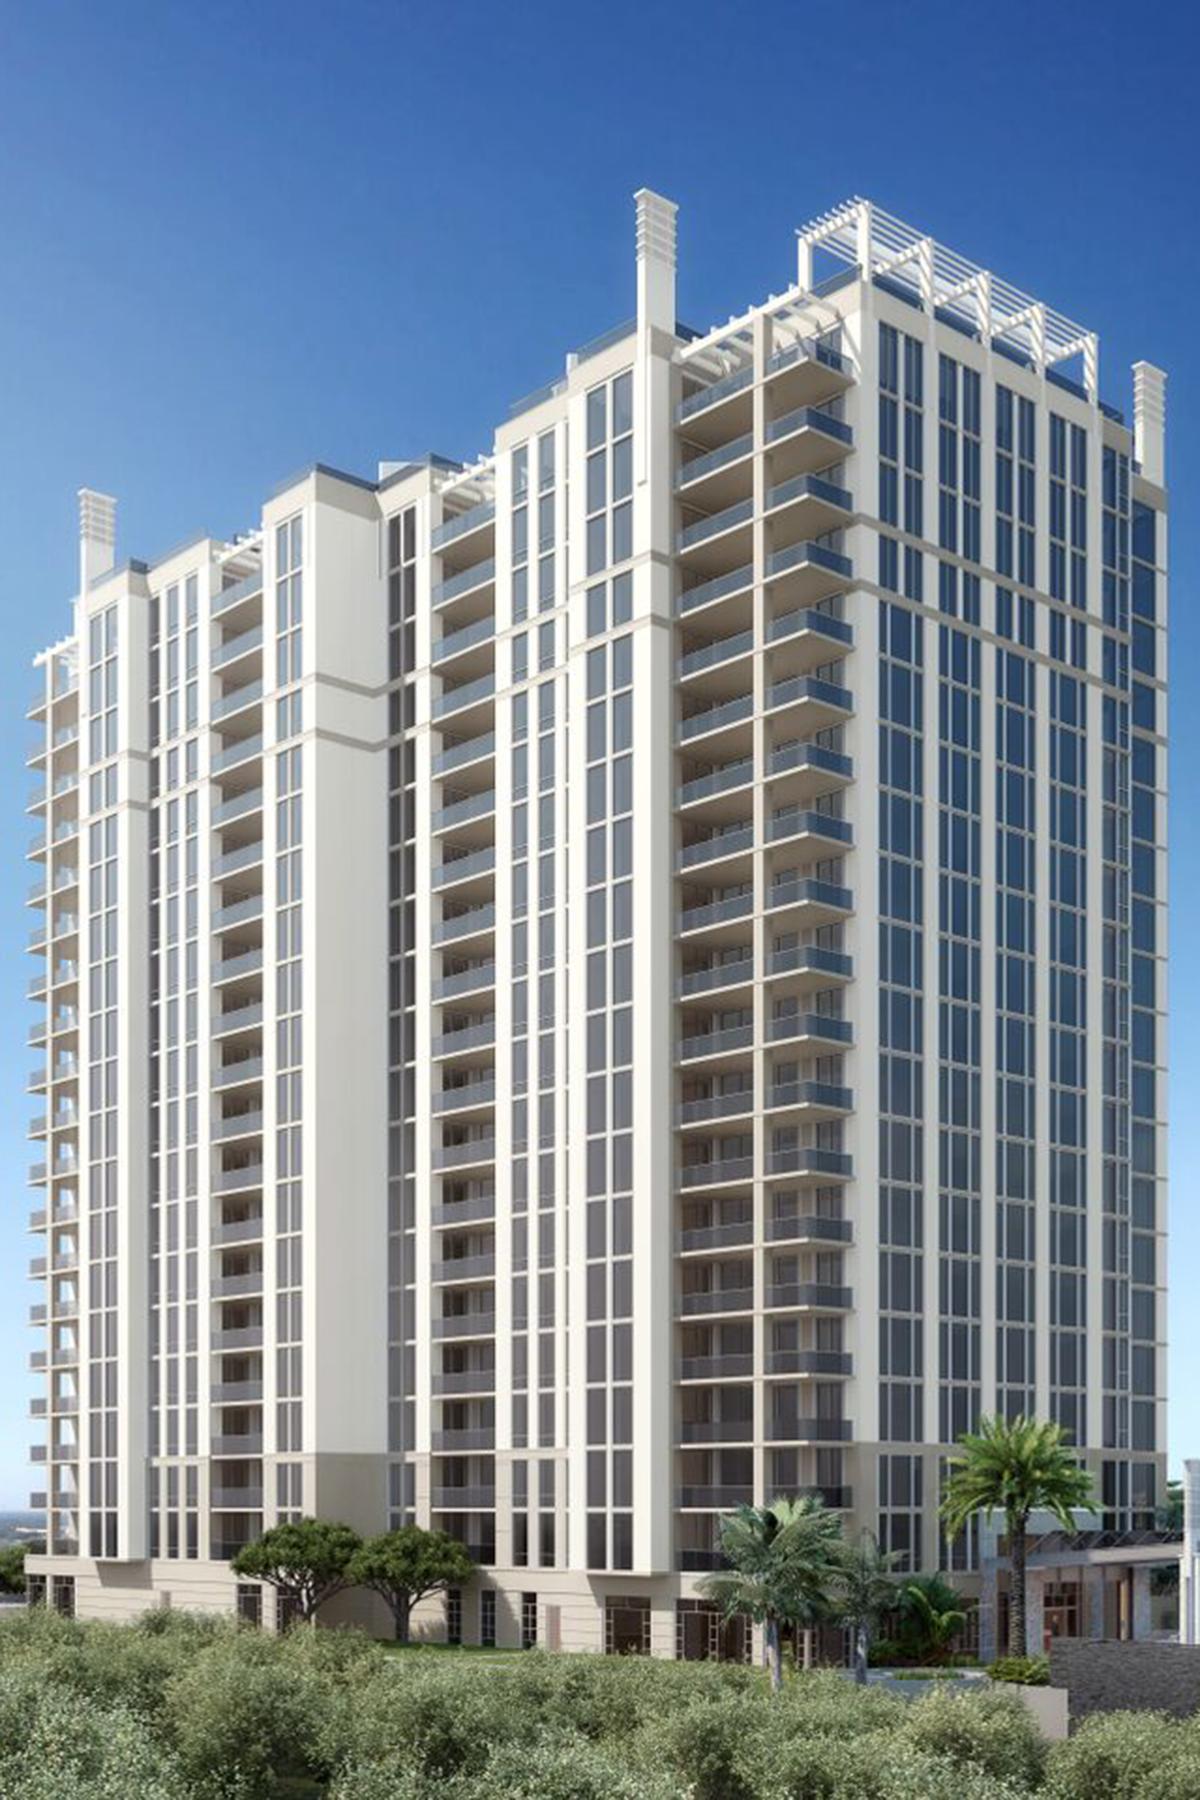 Additional photo for property listing at Naples 6897  Grenadier Blvd 701,  Naples, Florida 34108 United States